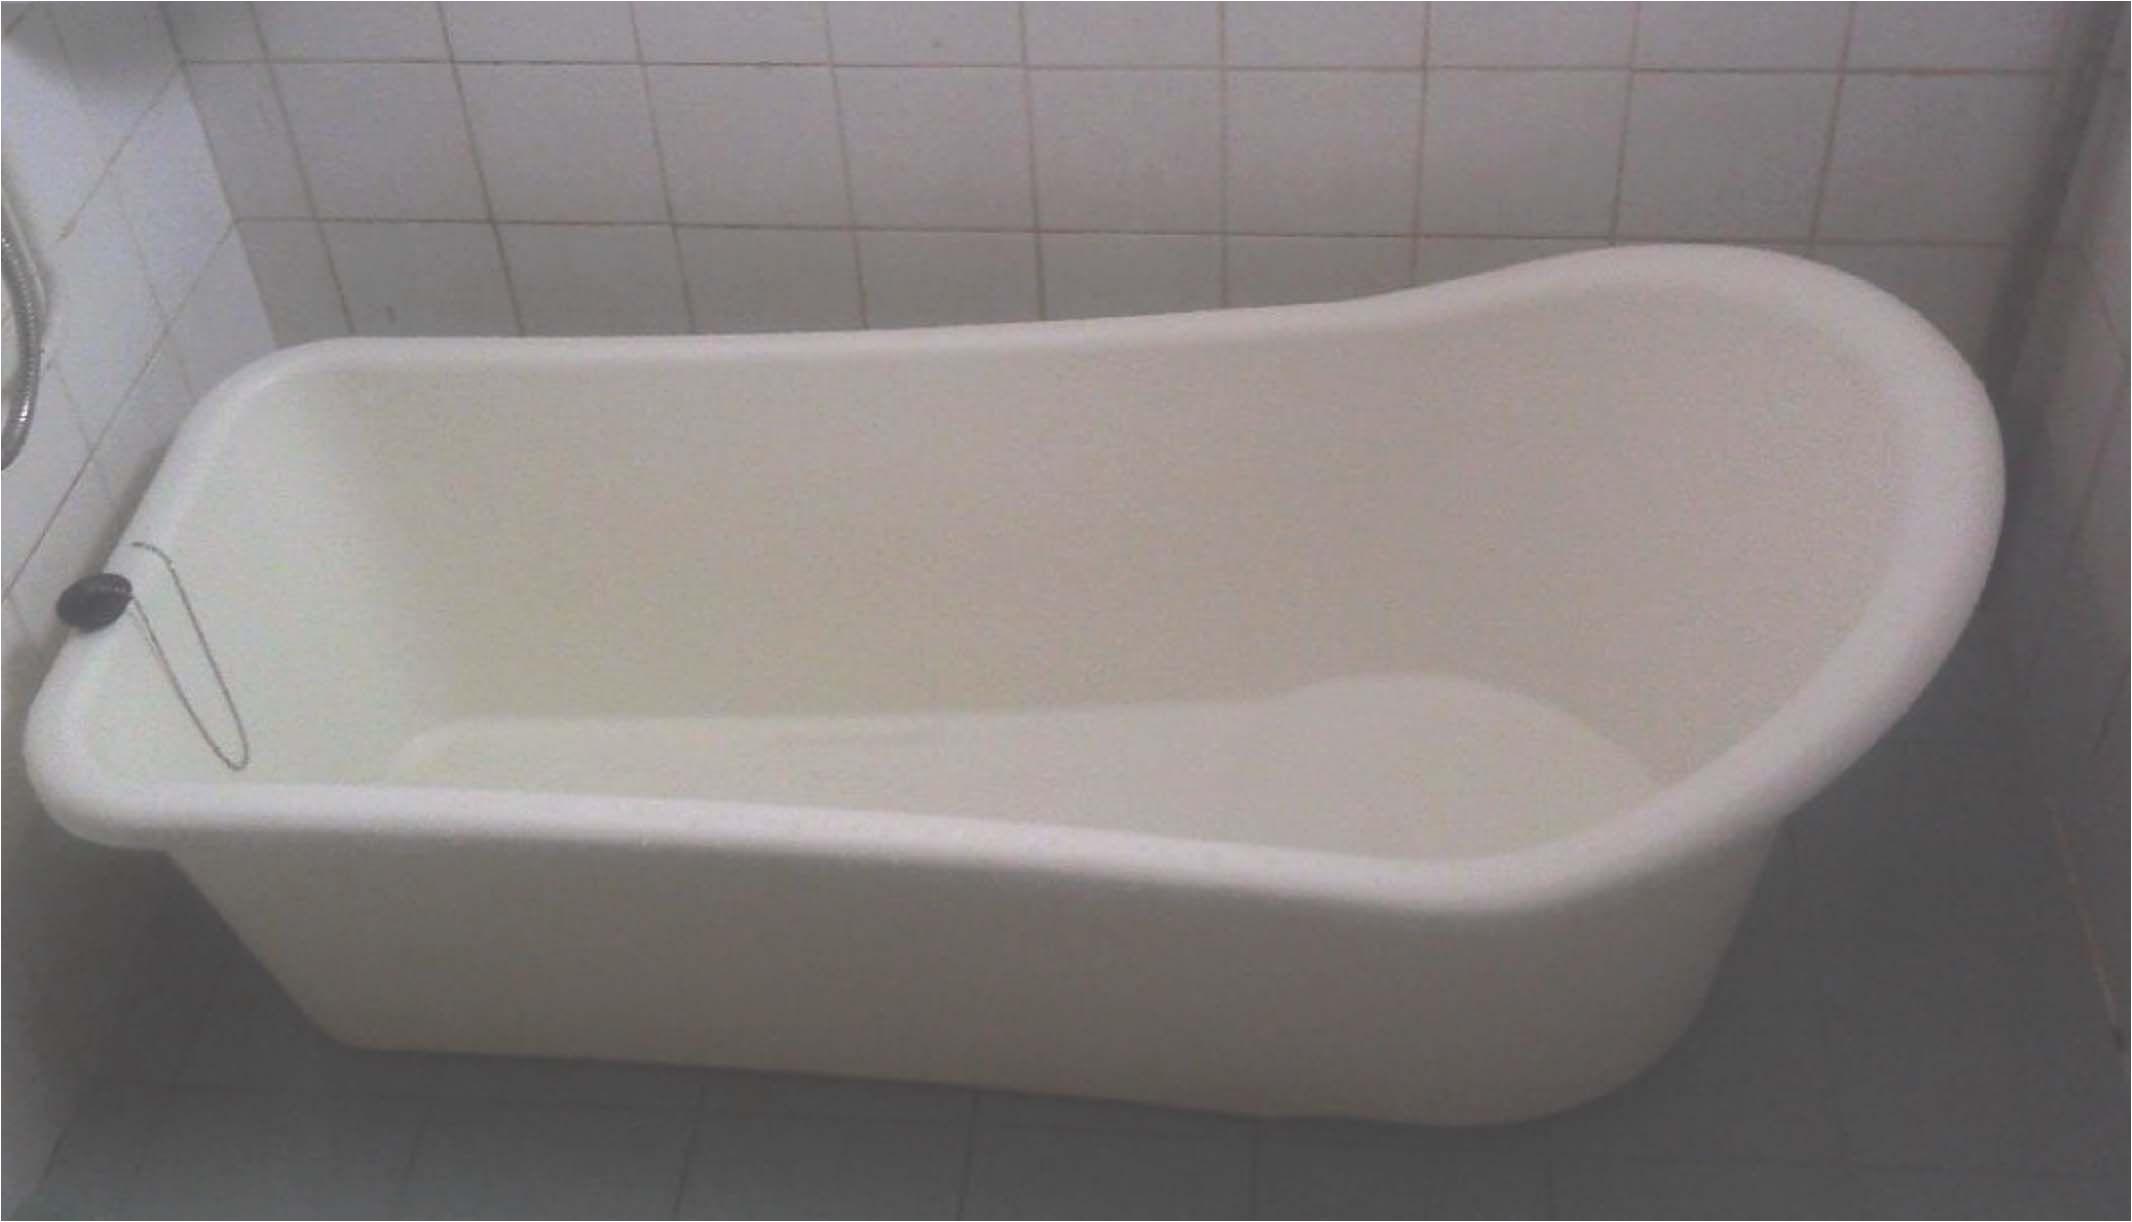 affordable and durable portable bathtub 1016 for children adult singapore none singapore fvstore apartment pinterest